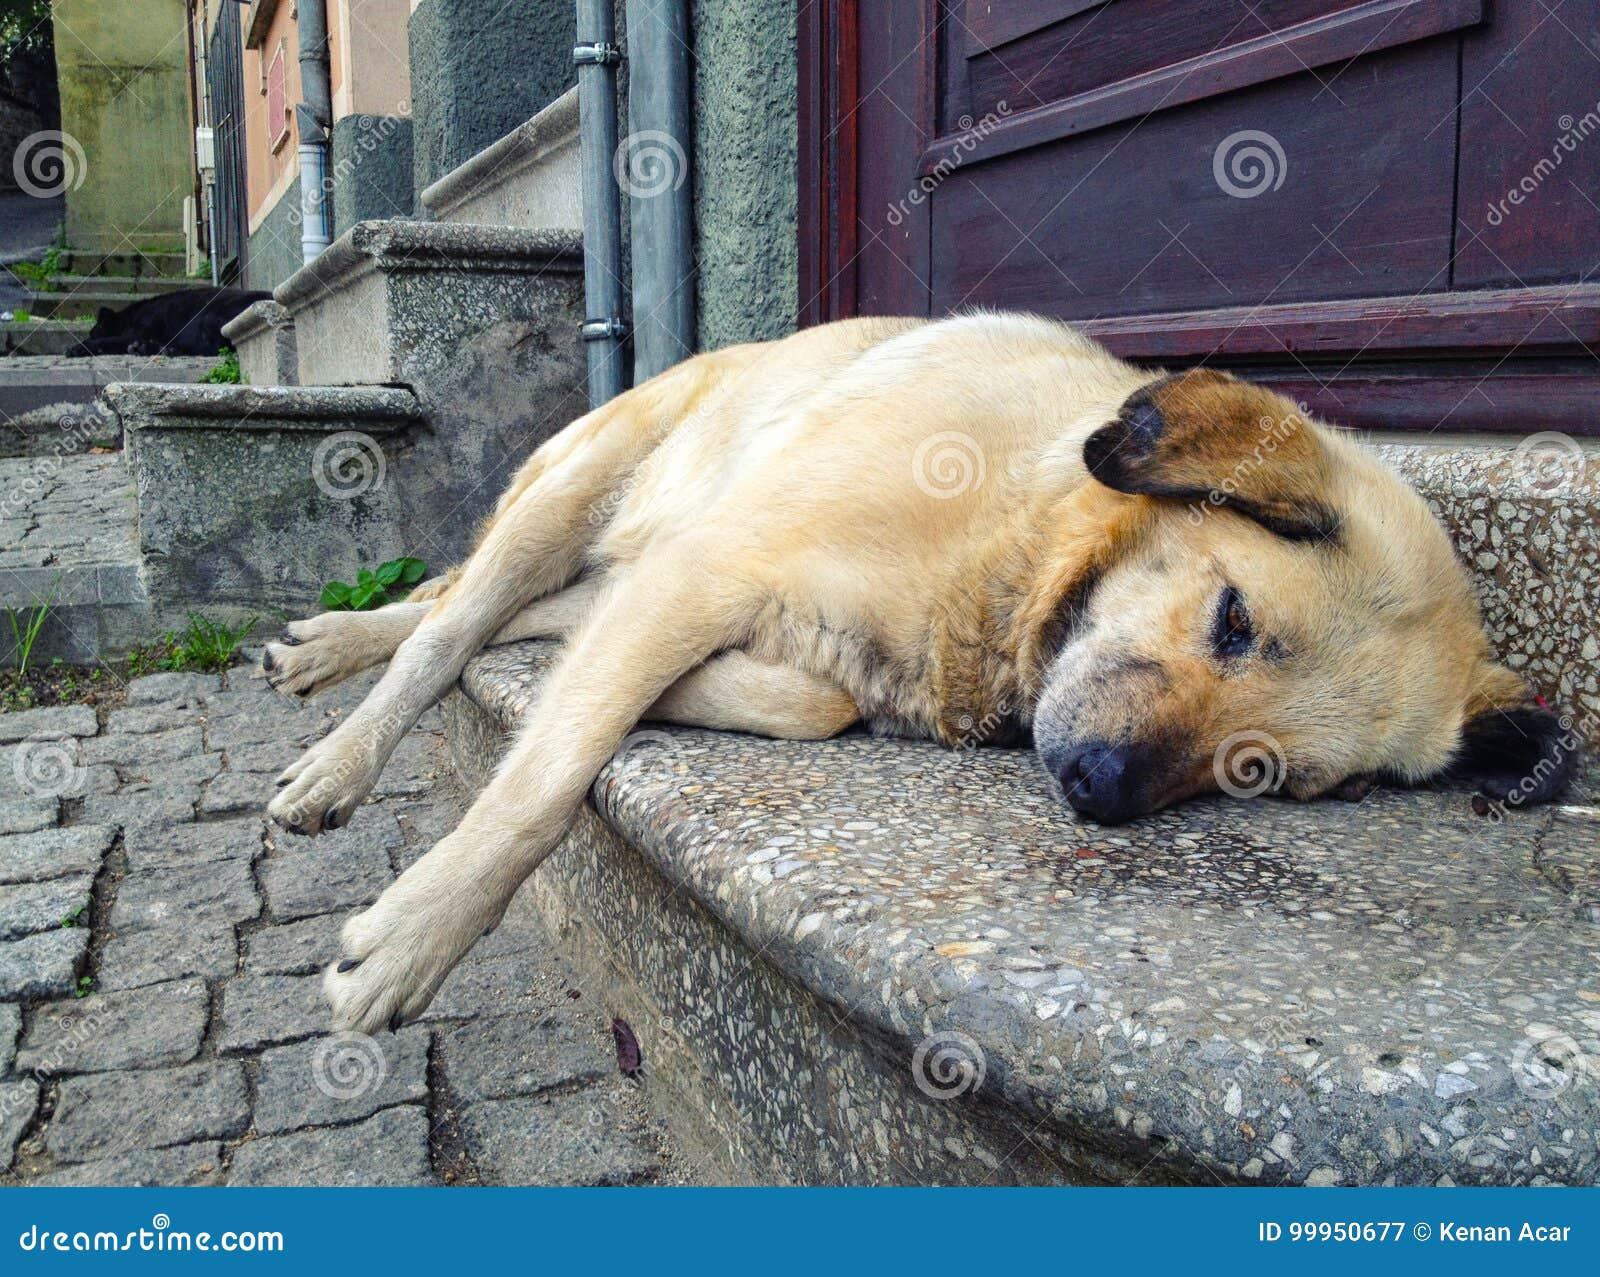 A tired street Dog